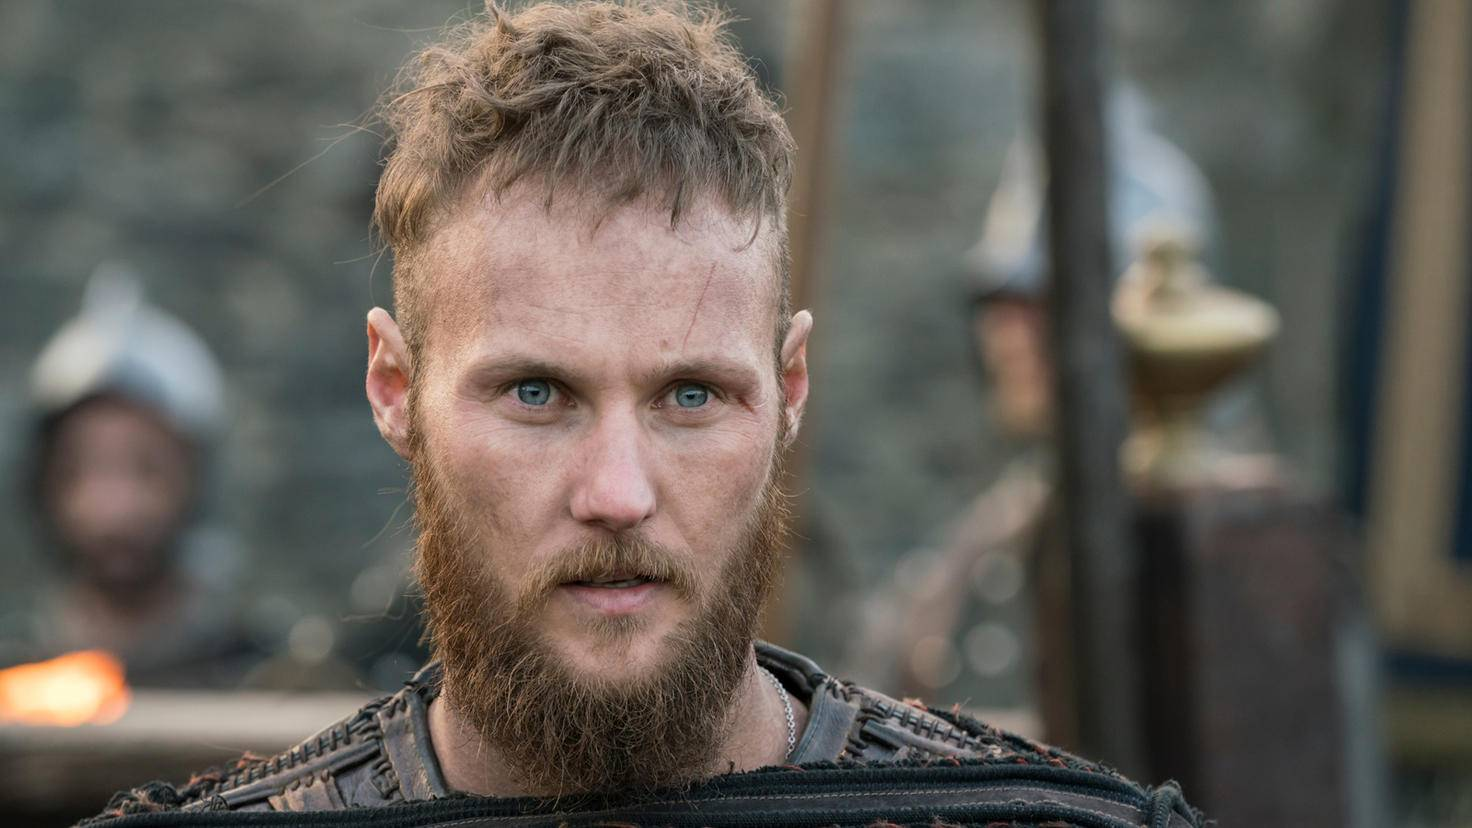 Ubbe Staffel 5 Part 2 Vikings